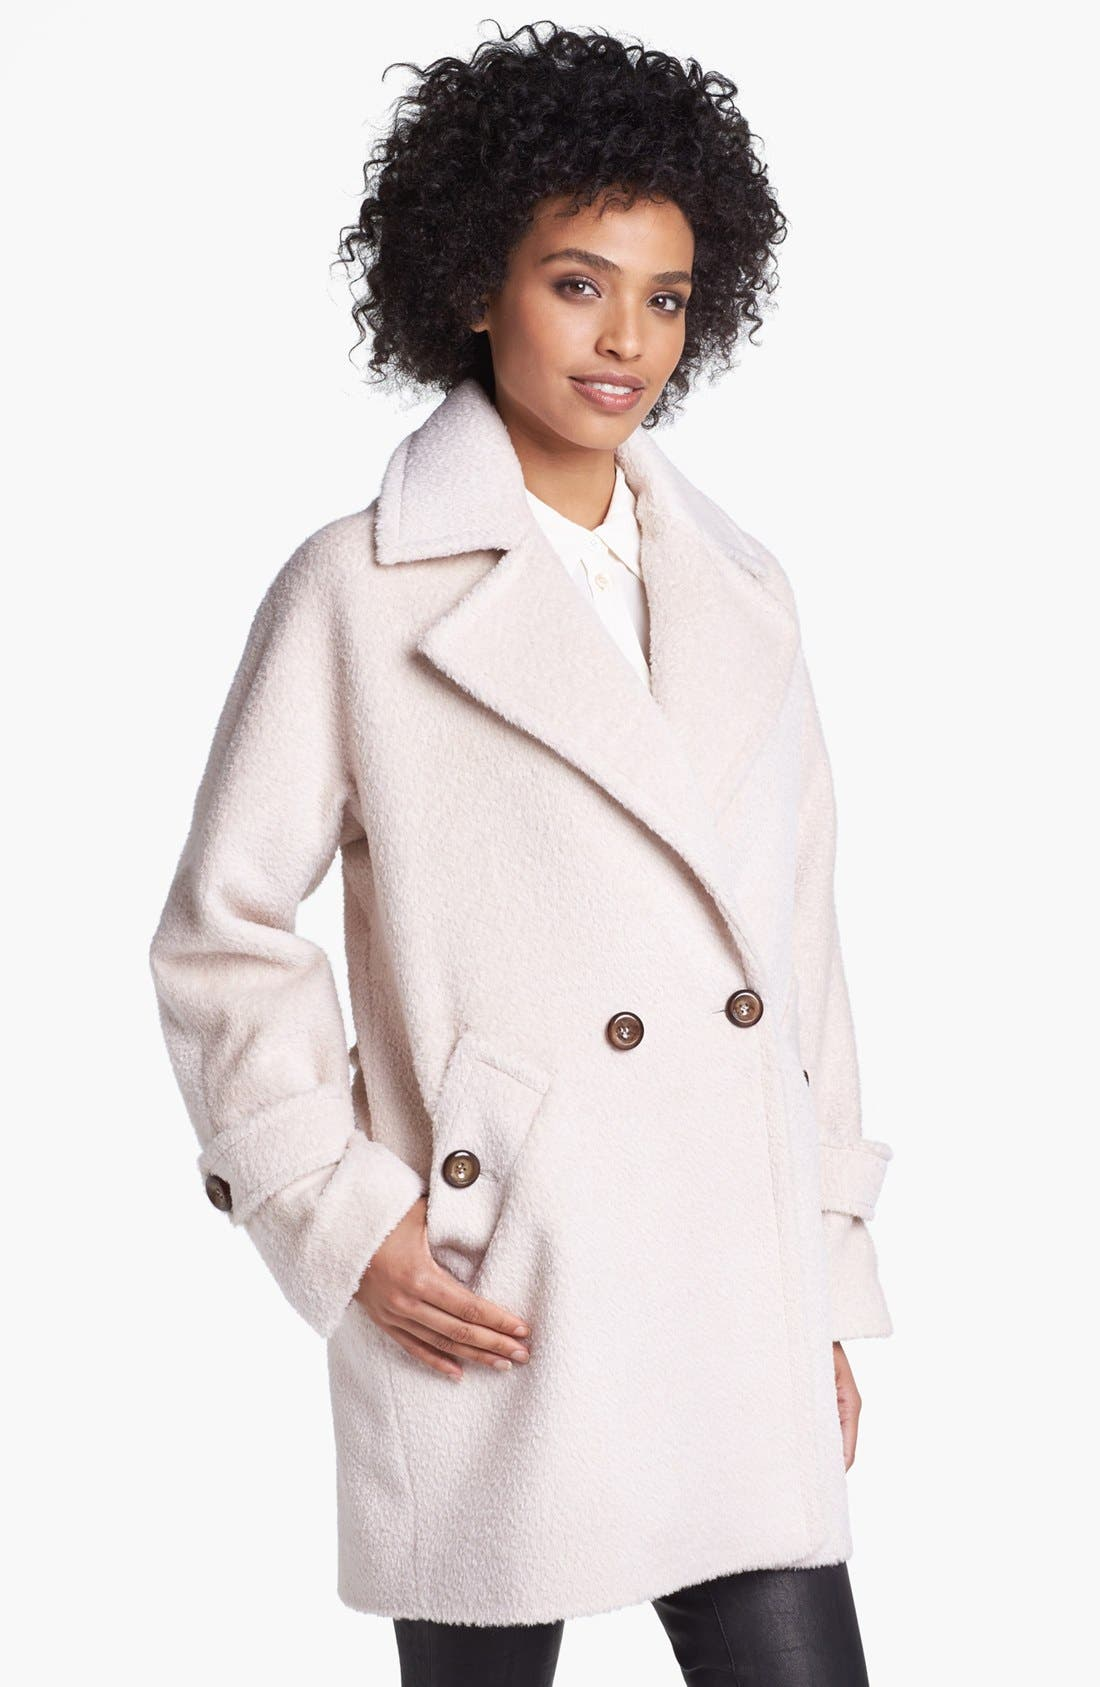 'Nancy' Sheared Wool & Alpaca Blend Coat,                             Main thumbnail 1, color,                             Champagne